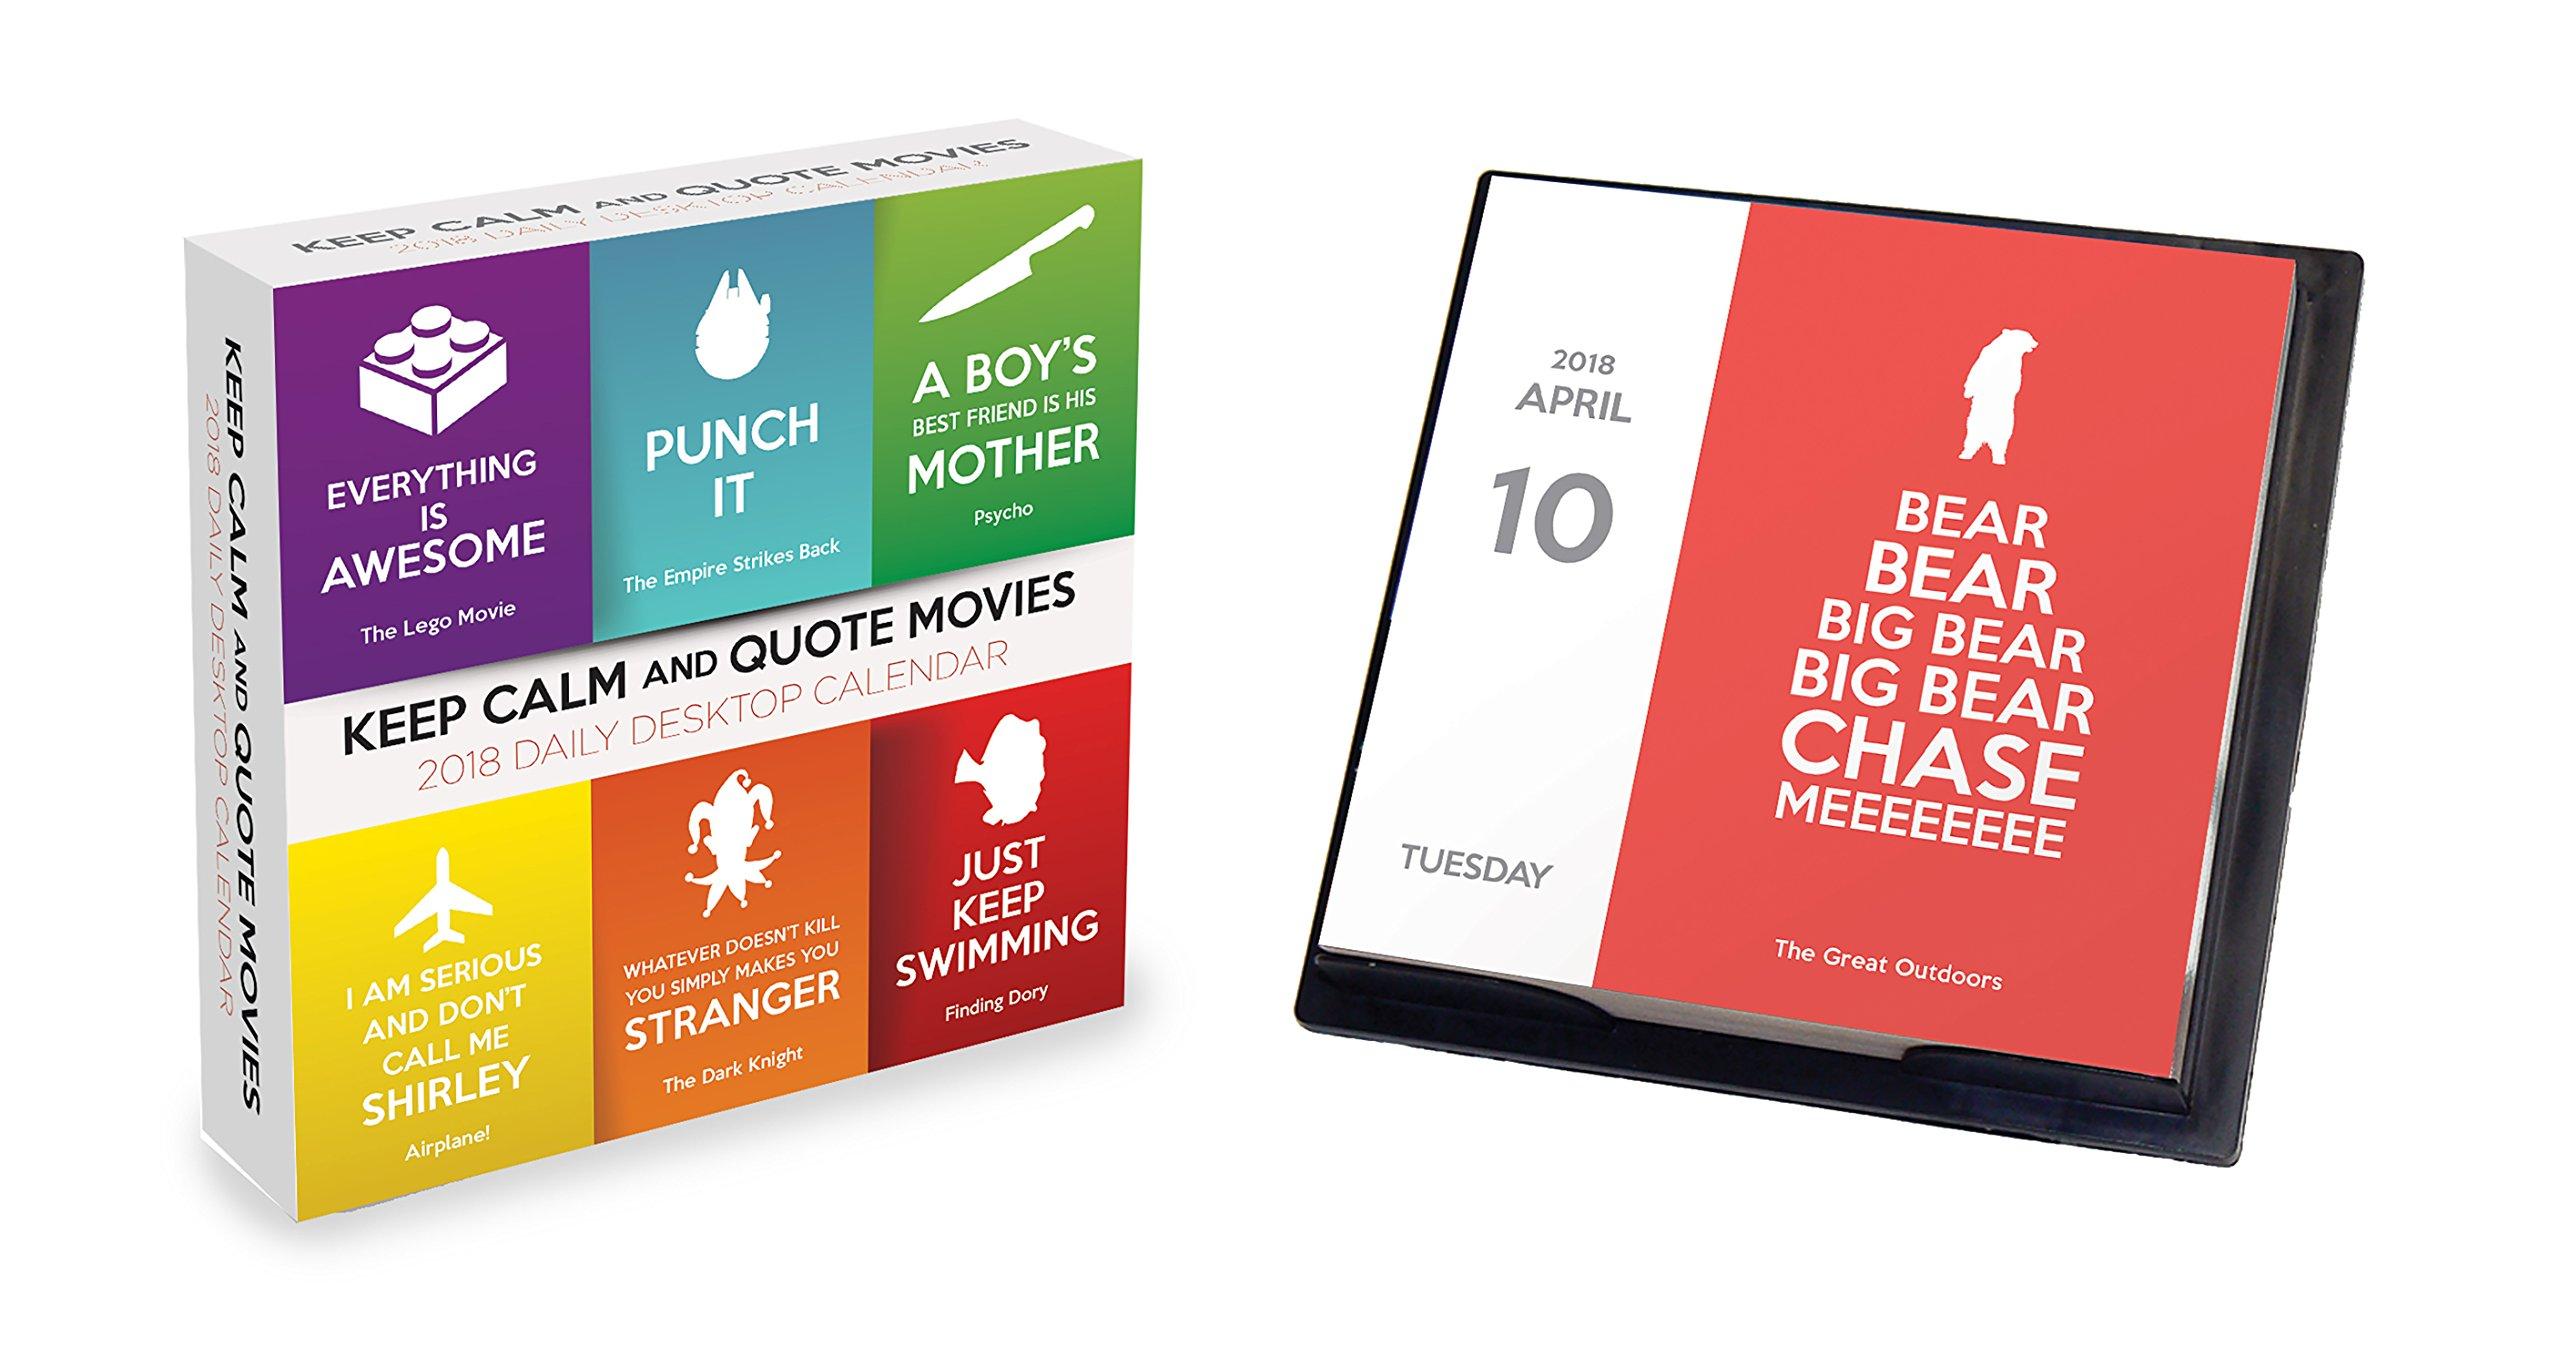 Calendar Design Quote : Keep calm and quote movies daily desktop calendar tf